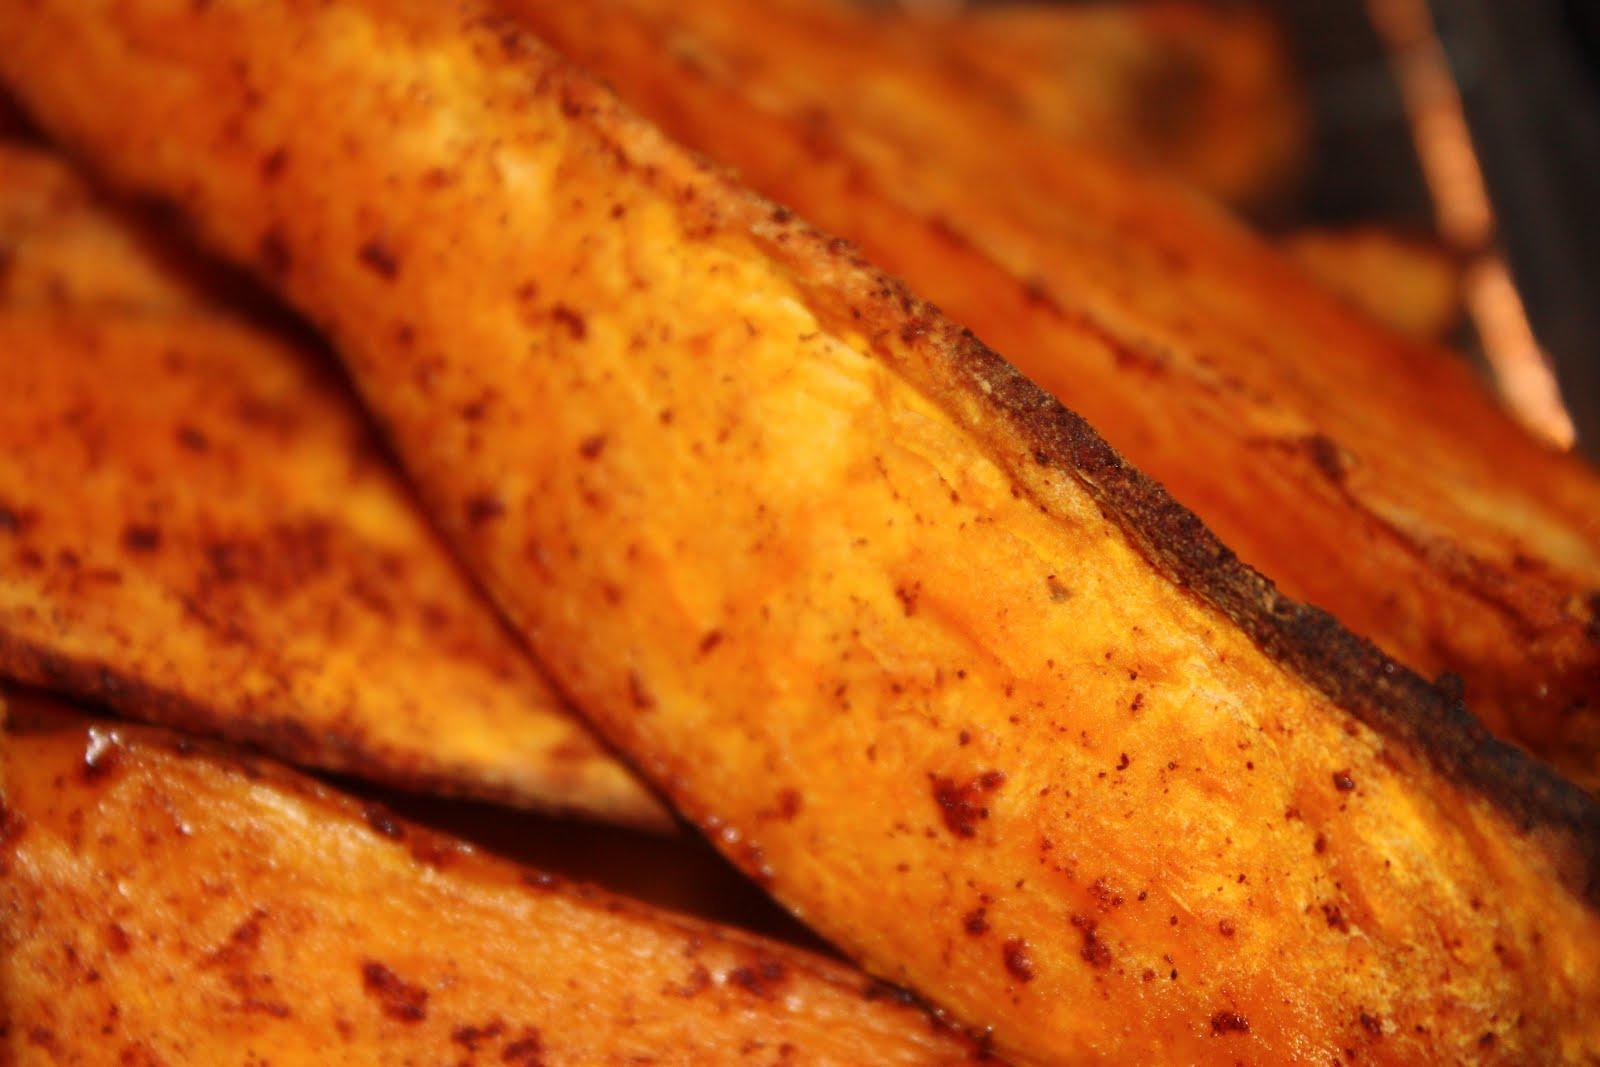 ... potato wedges cajun spiced potato wedges oven baked potato wedges